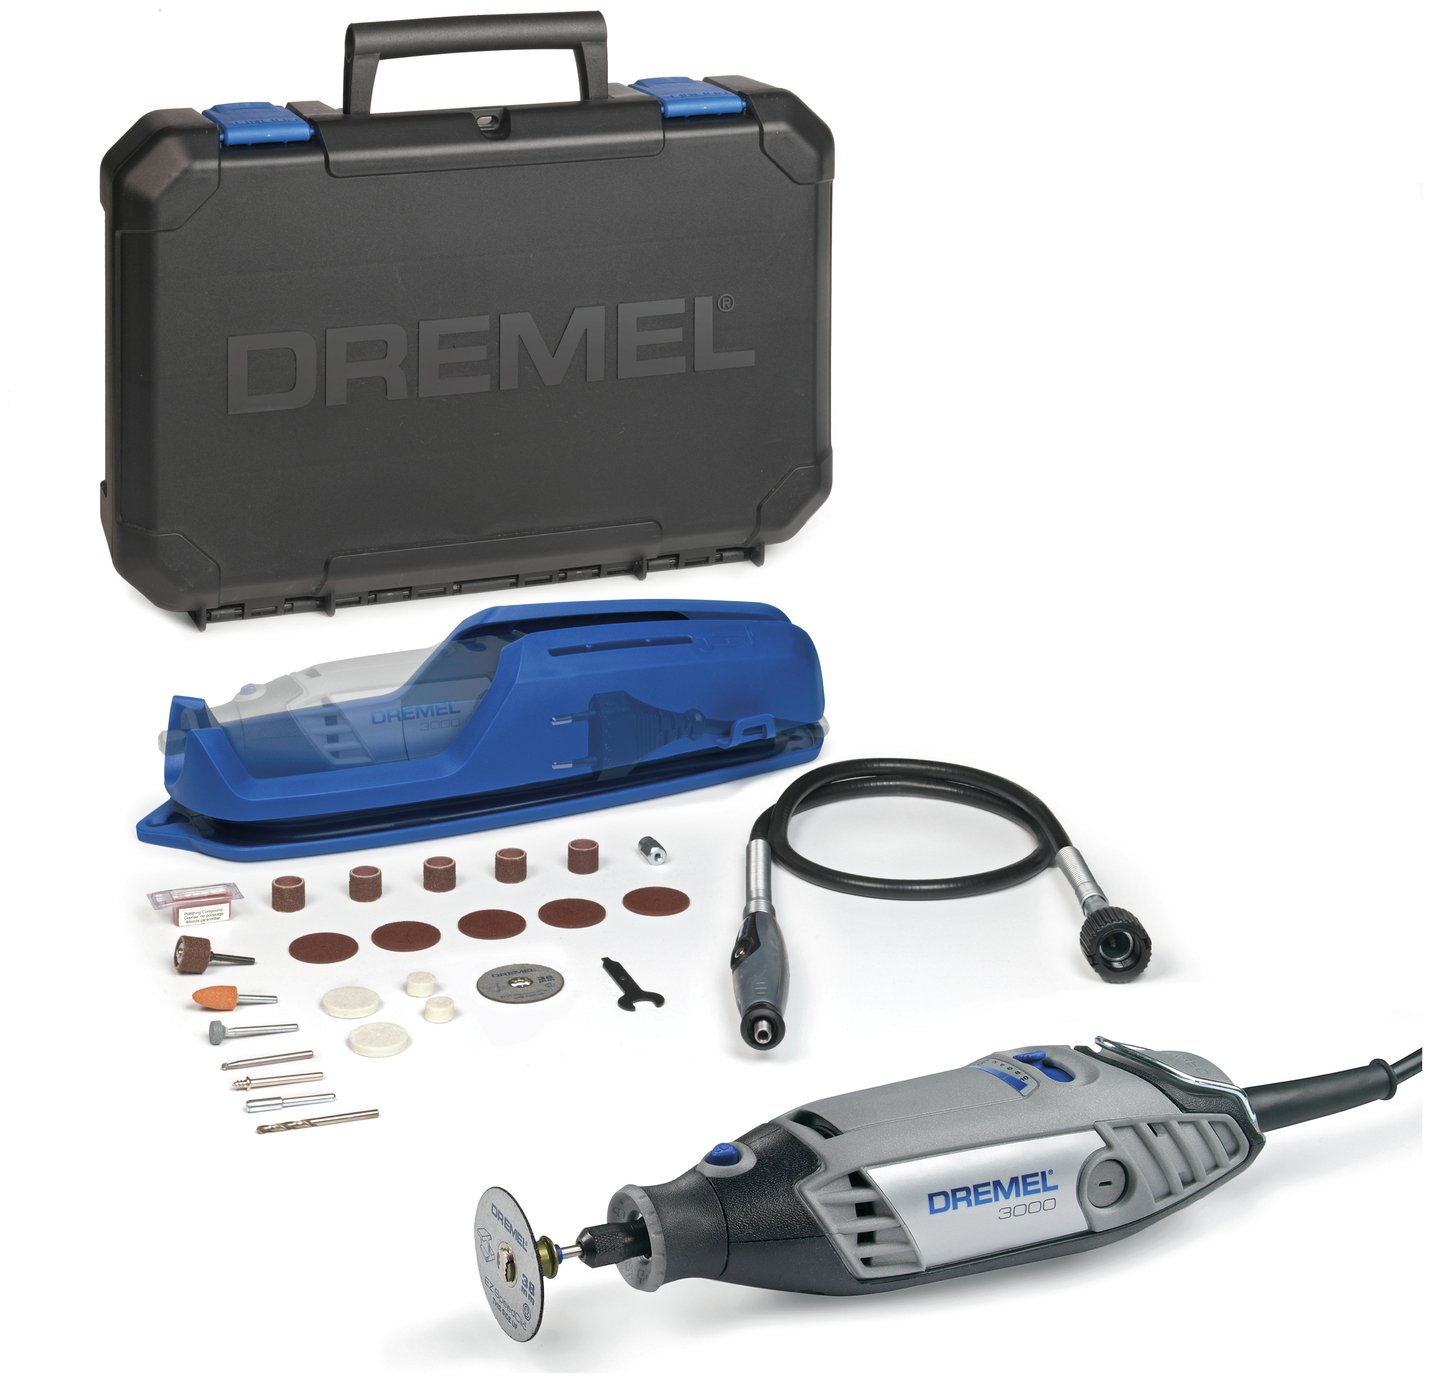 Image of Dremel 3000 Multi-tool